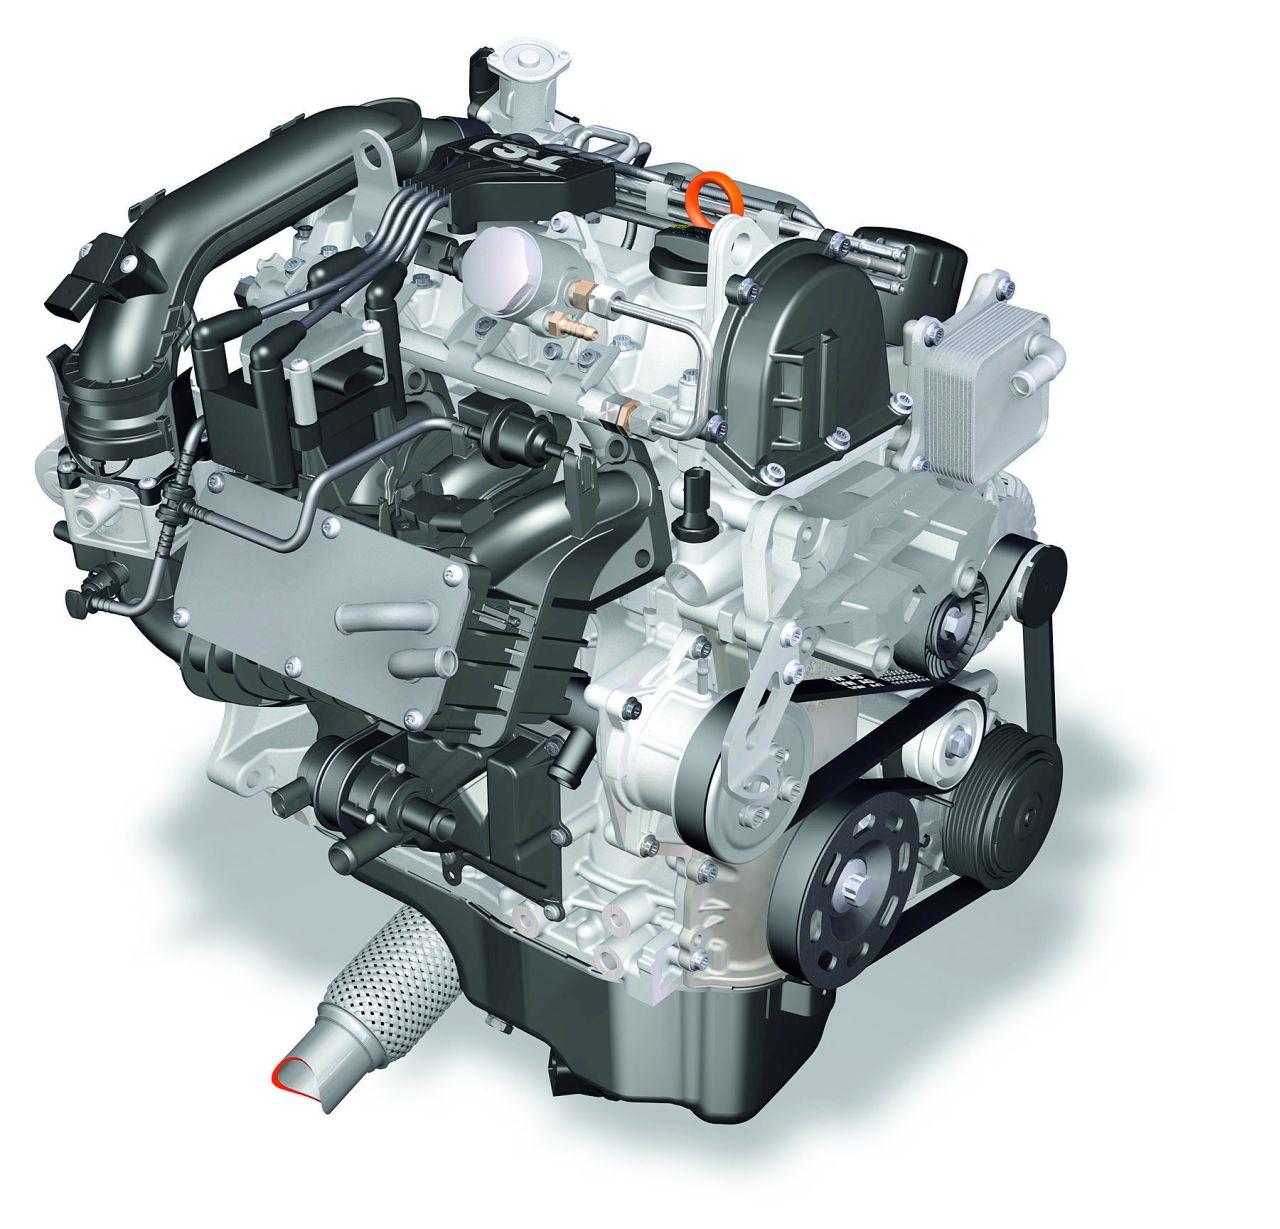 Quattro cilindri 1.4 TSI twincharged Volkswagen addio